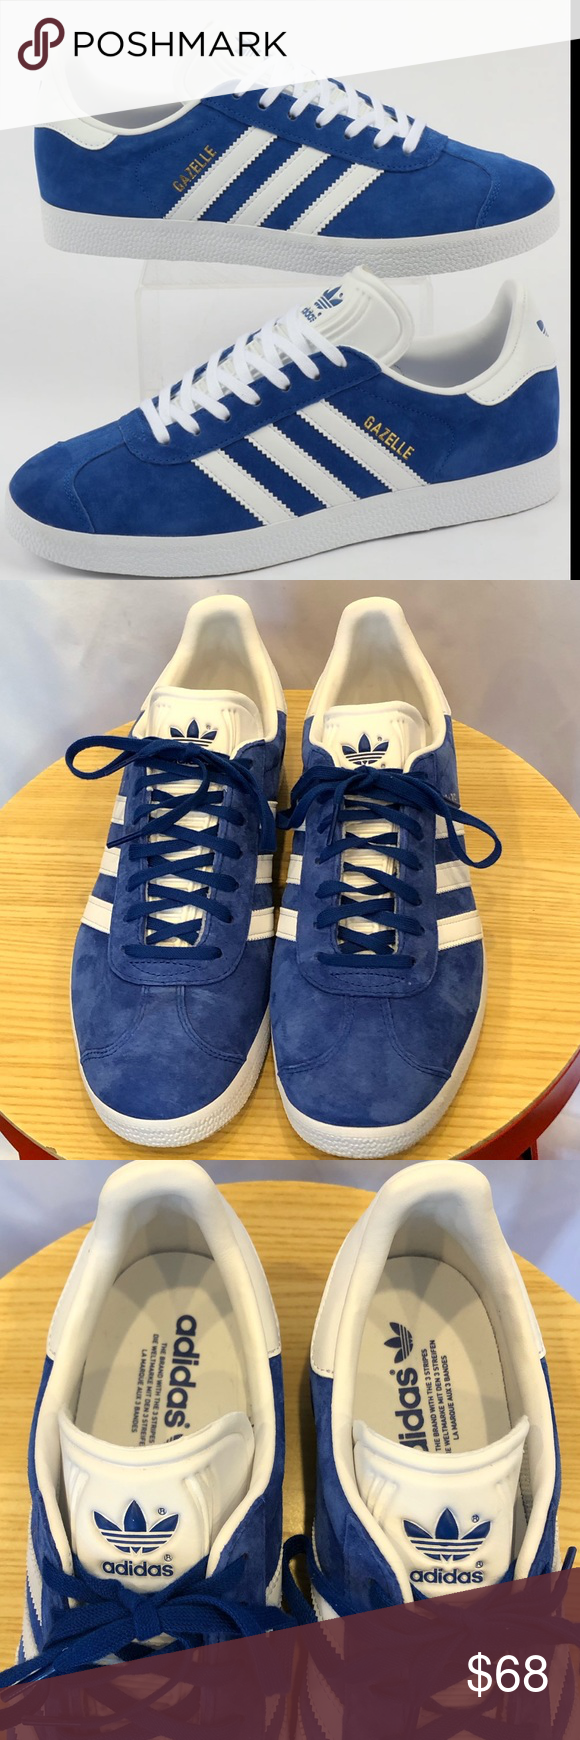 Adidas Gazelle blue suede white stripes men's 10.5 in 2020